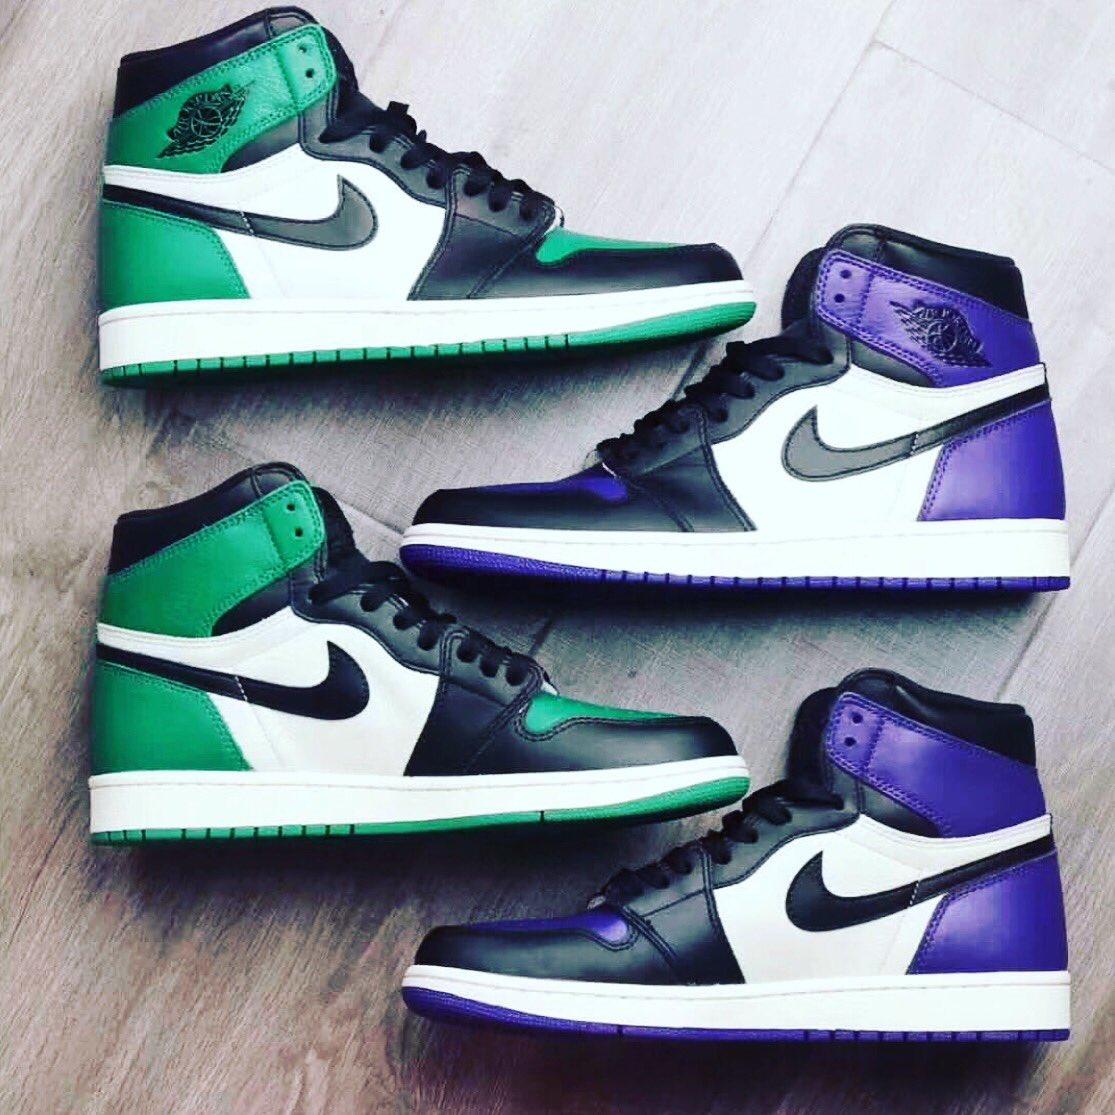 20bc74ce592d4 ...  jordan1courtpurple  courtpurple  mj  nike  raffle  hypebeast  supreme   adidas  yeezy  shoes  shoeporn  sneakers  sneakerporn  sneakerhead   sneakernews ...